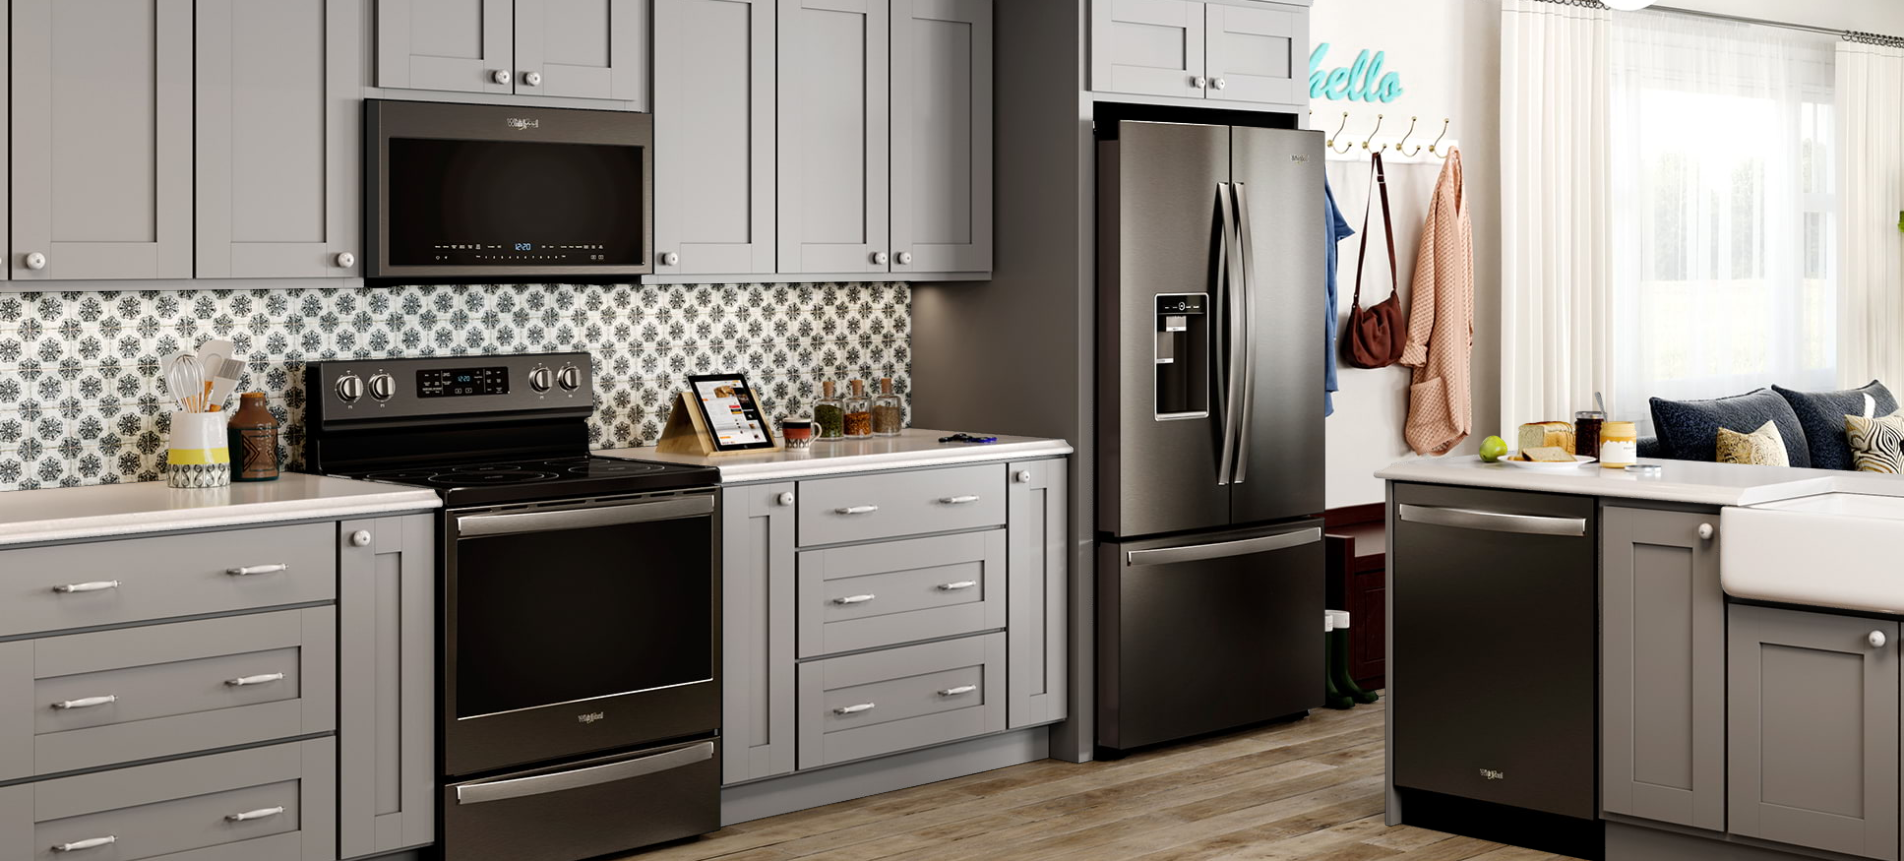 Whirlpool Appliances Black Stainless w/ Light Gray